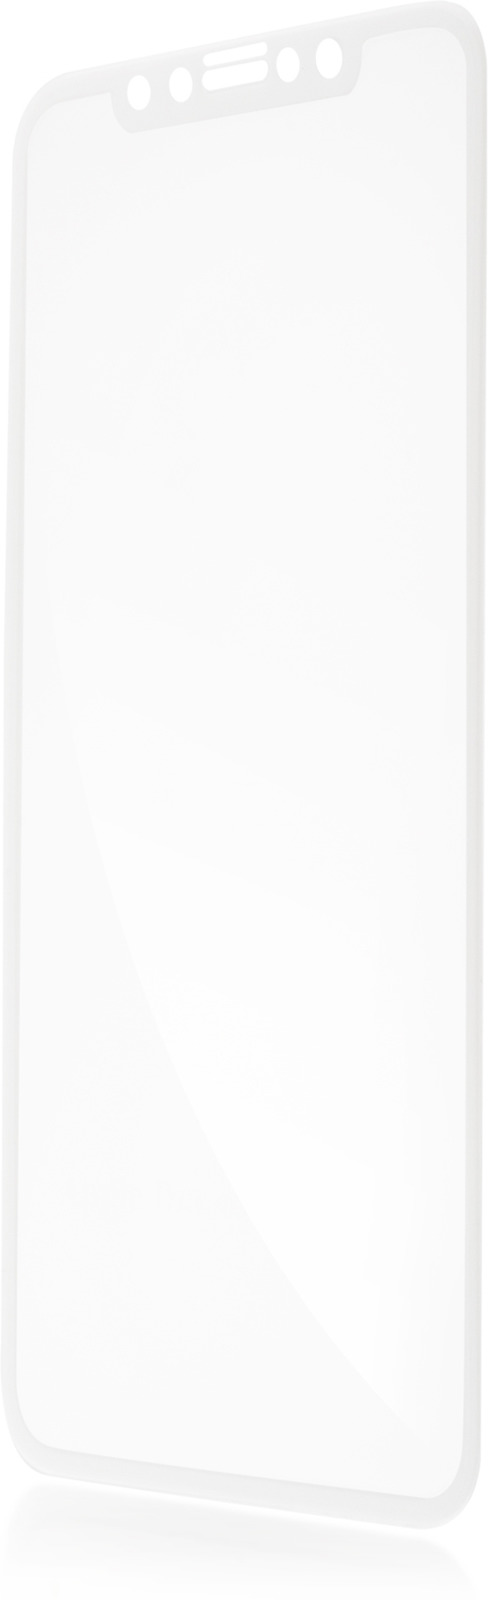 Защитное стекло Brosco 3D для Apple iPhone X, белый цена и фото